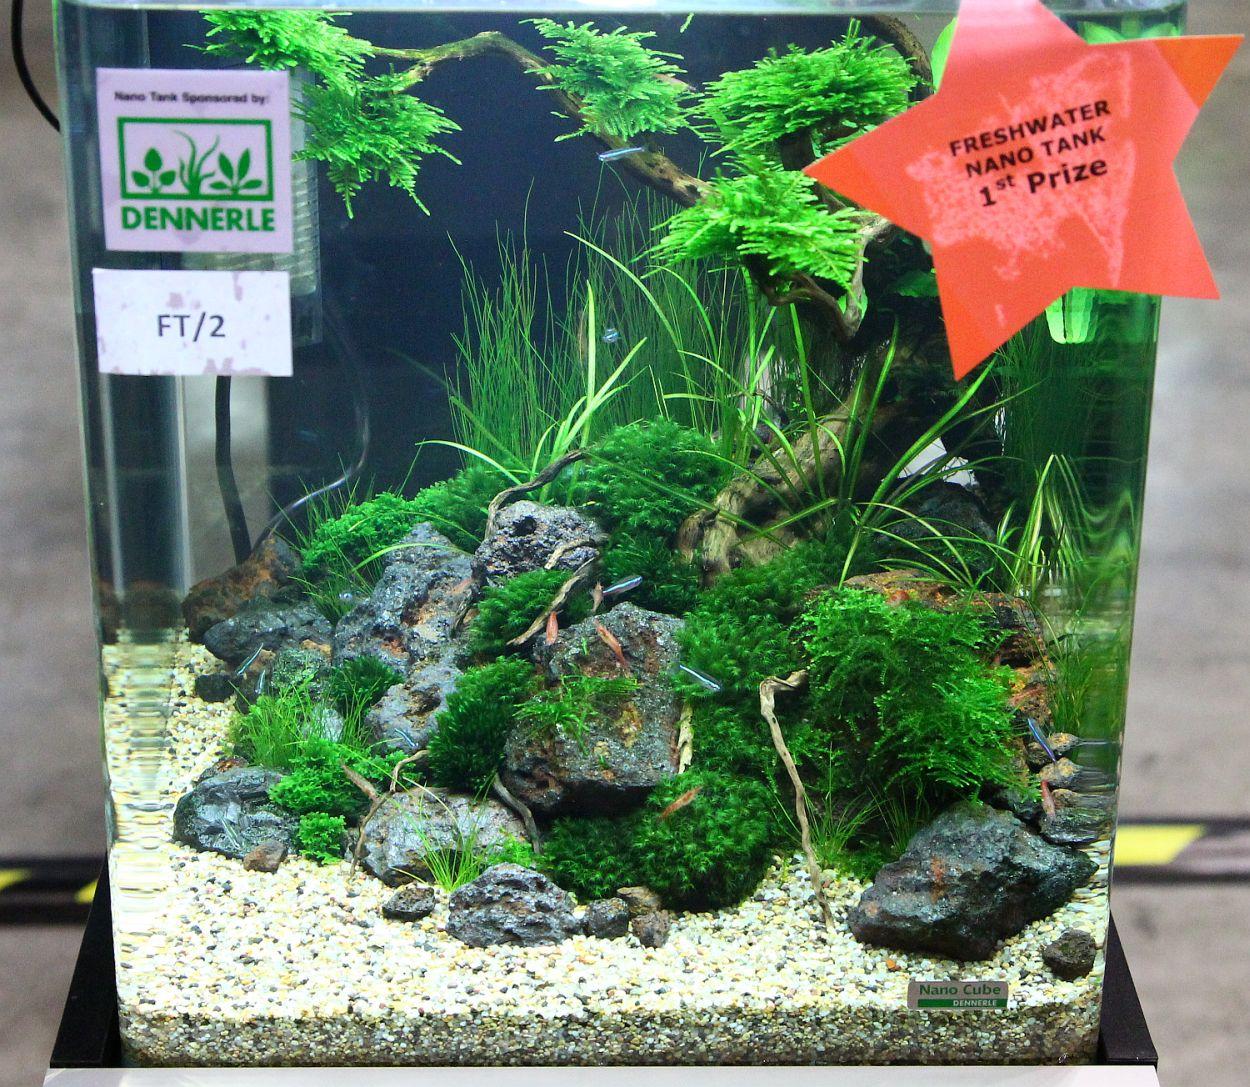 Freshwater aquarium fish from asia - Freshwater Aquarium Fish From Asia